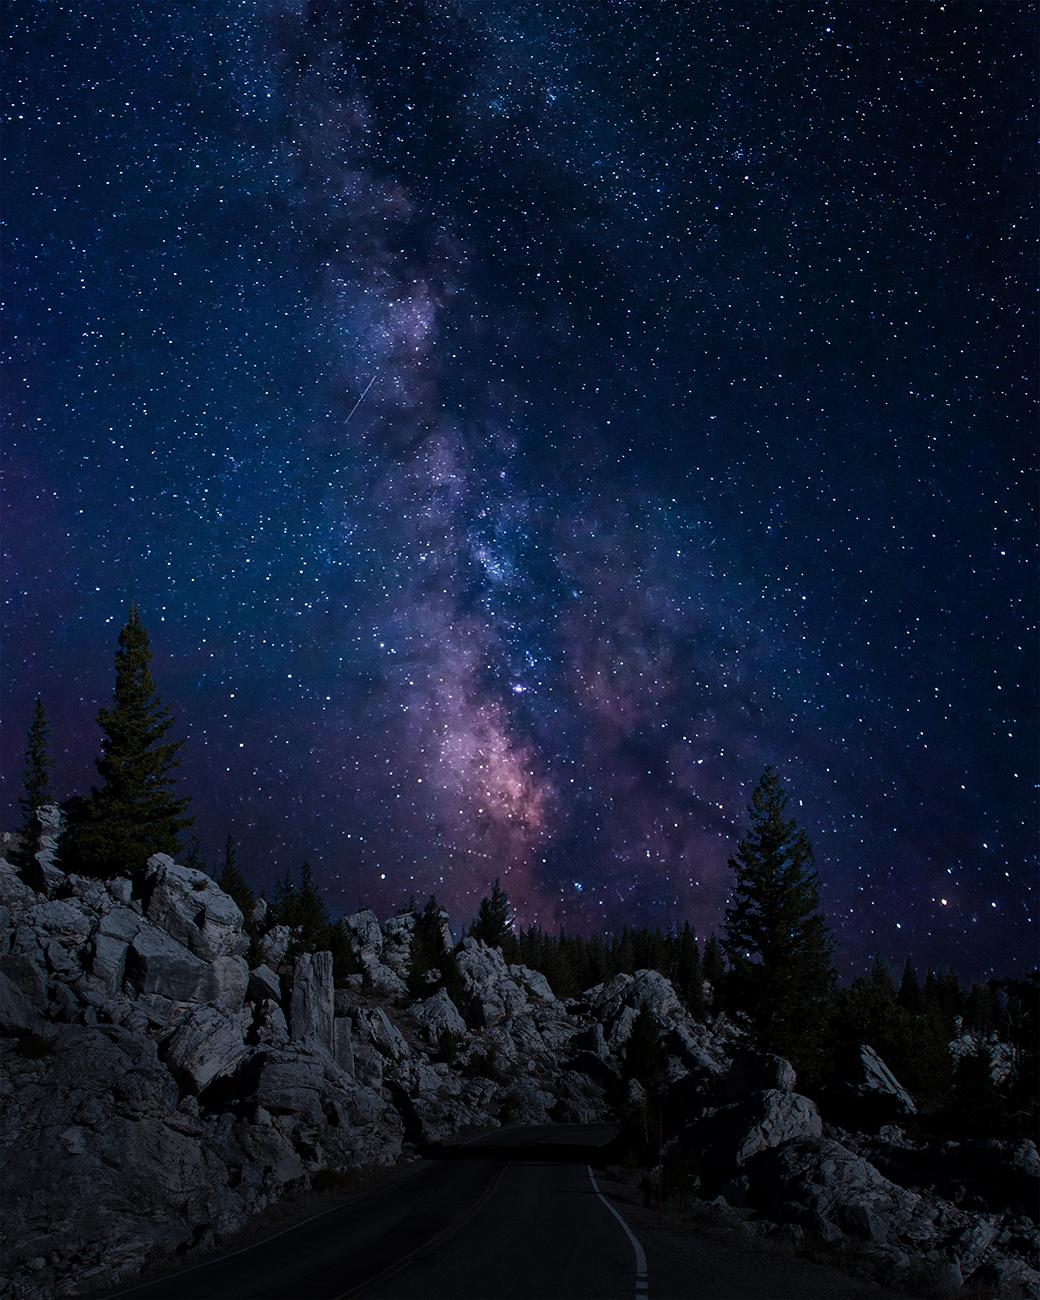 Milky way over montana - 2014Photoshop CC